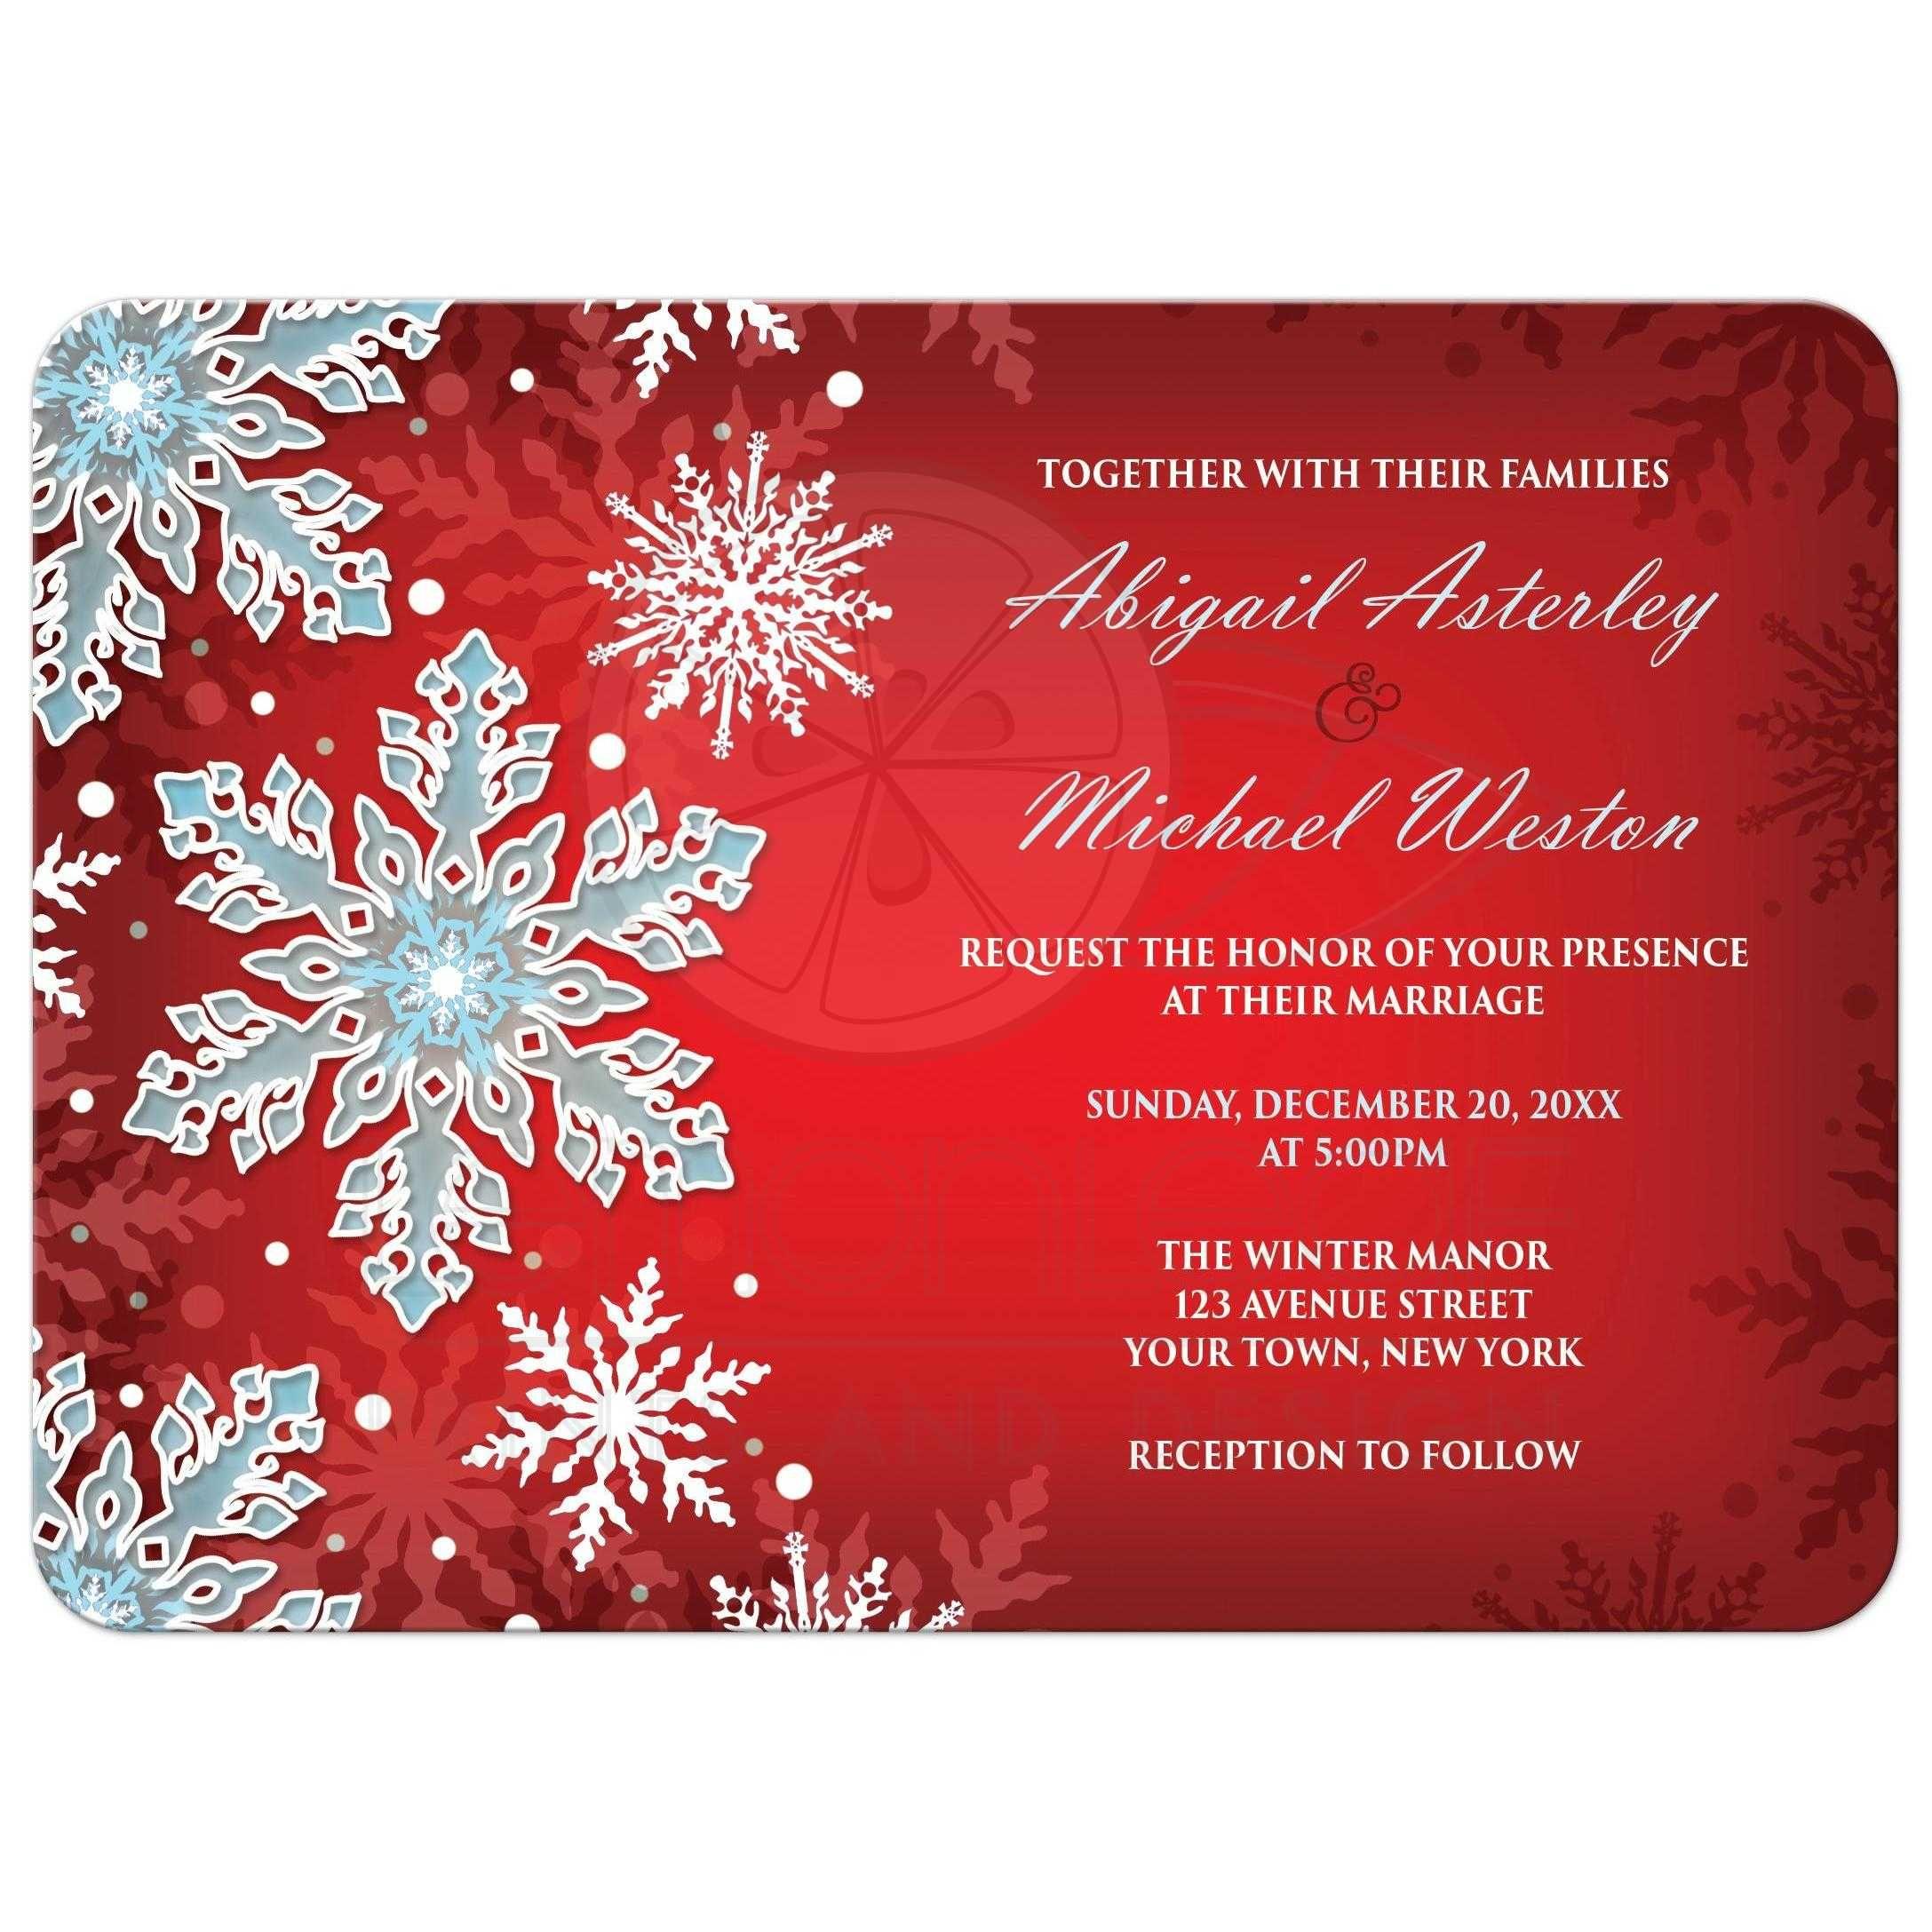 Wedding Invitations - Royal Red White Blue Snowflake | A Winter ...